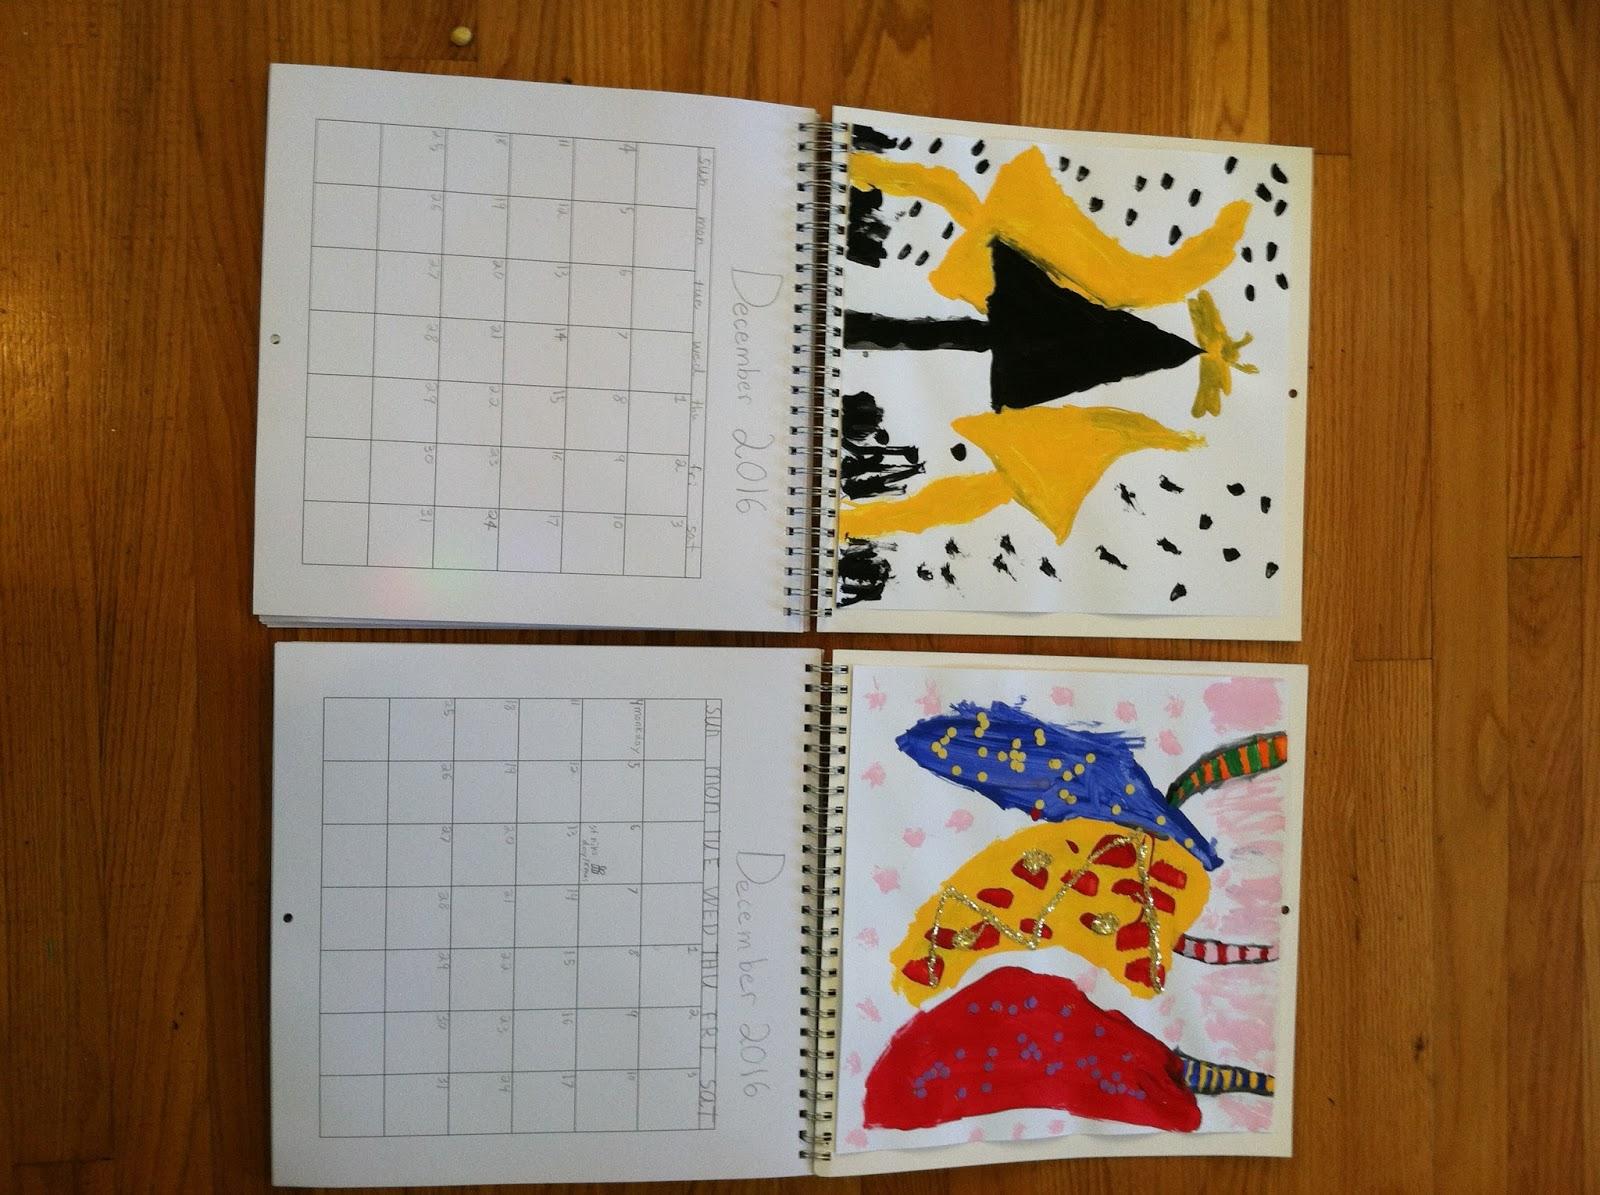 Switzerite Notes On Homemade Calendar Activity